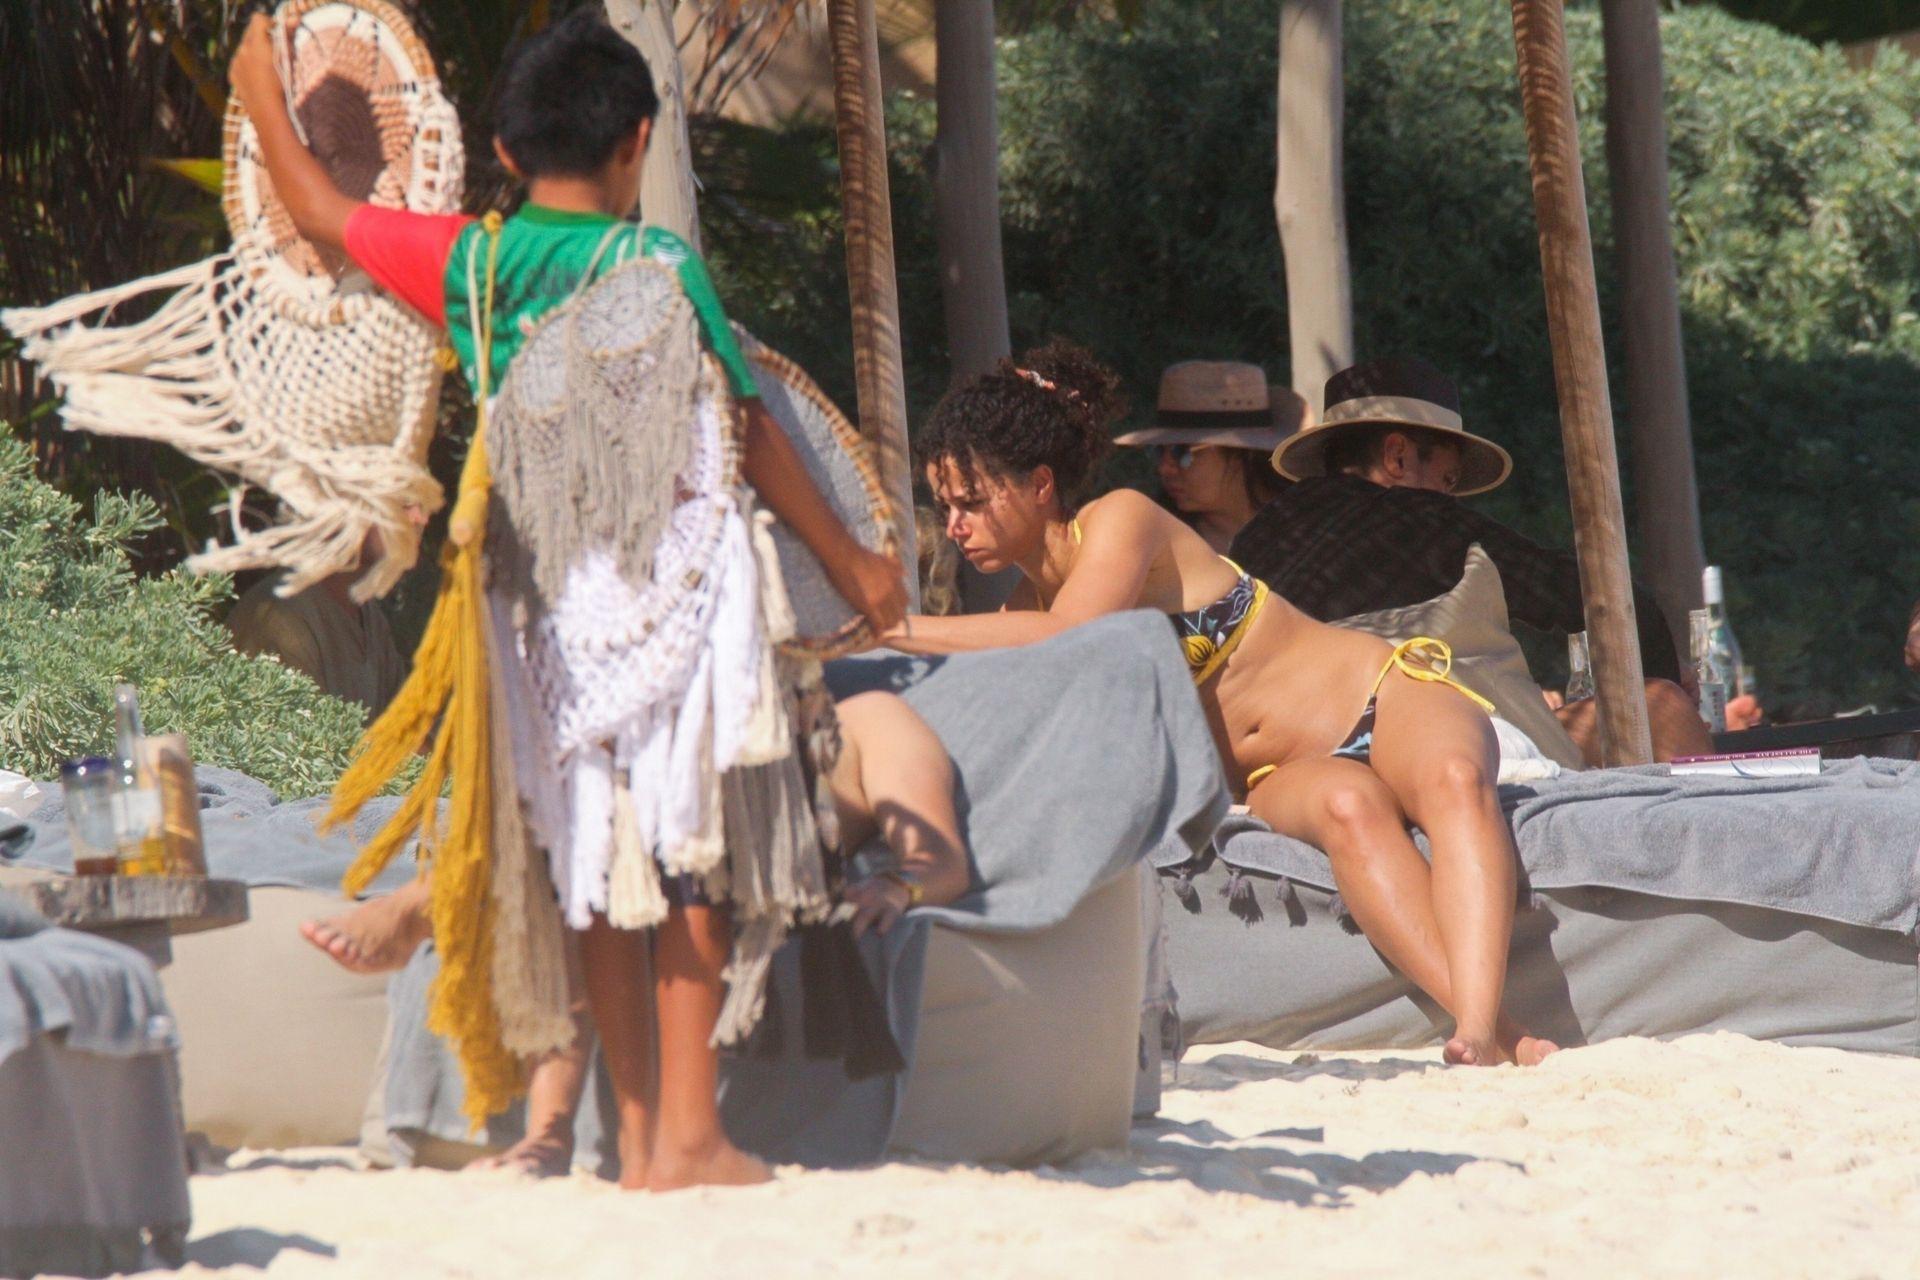 Alisha Wainwright Enjoys A Sun Filled Getaway In Tulum 0053